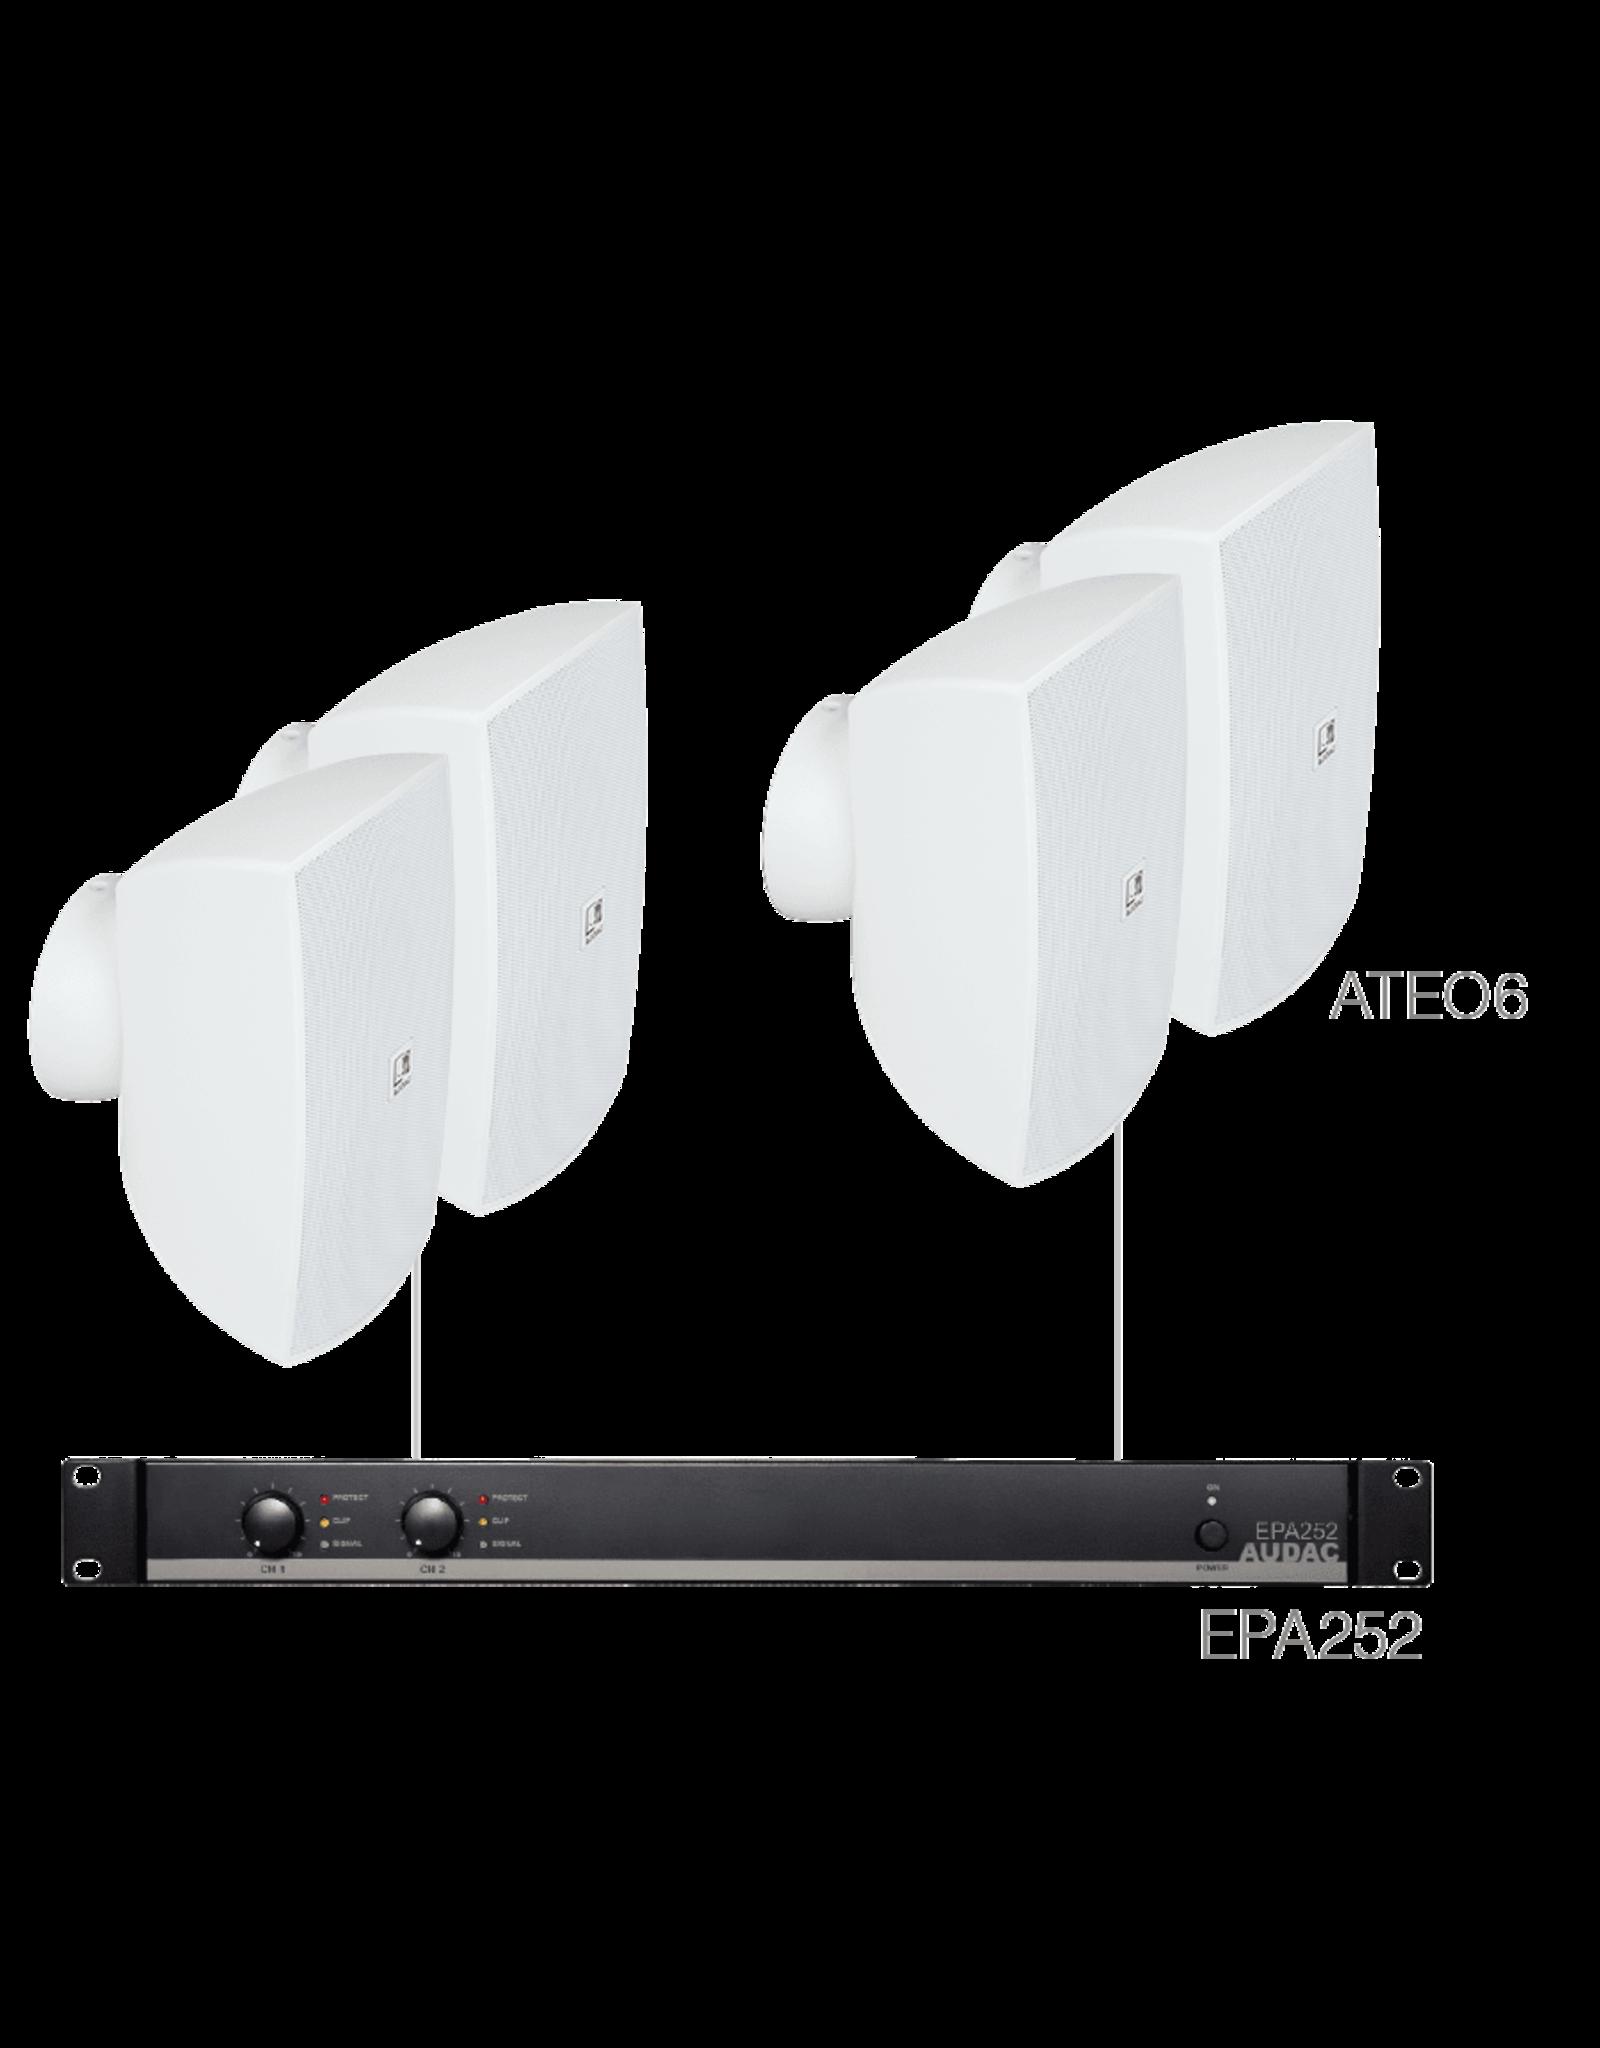 Audac 4 x ATEO6 + EPA252 White